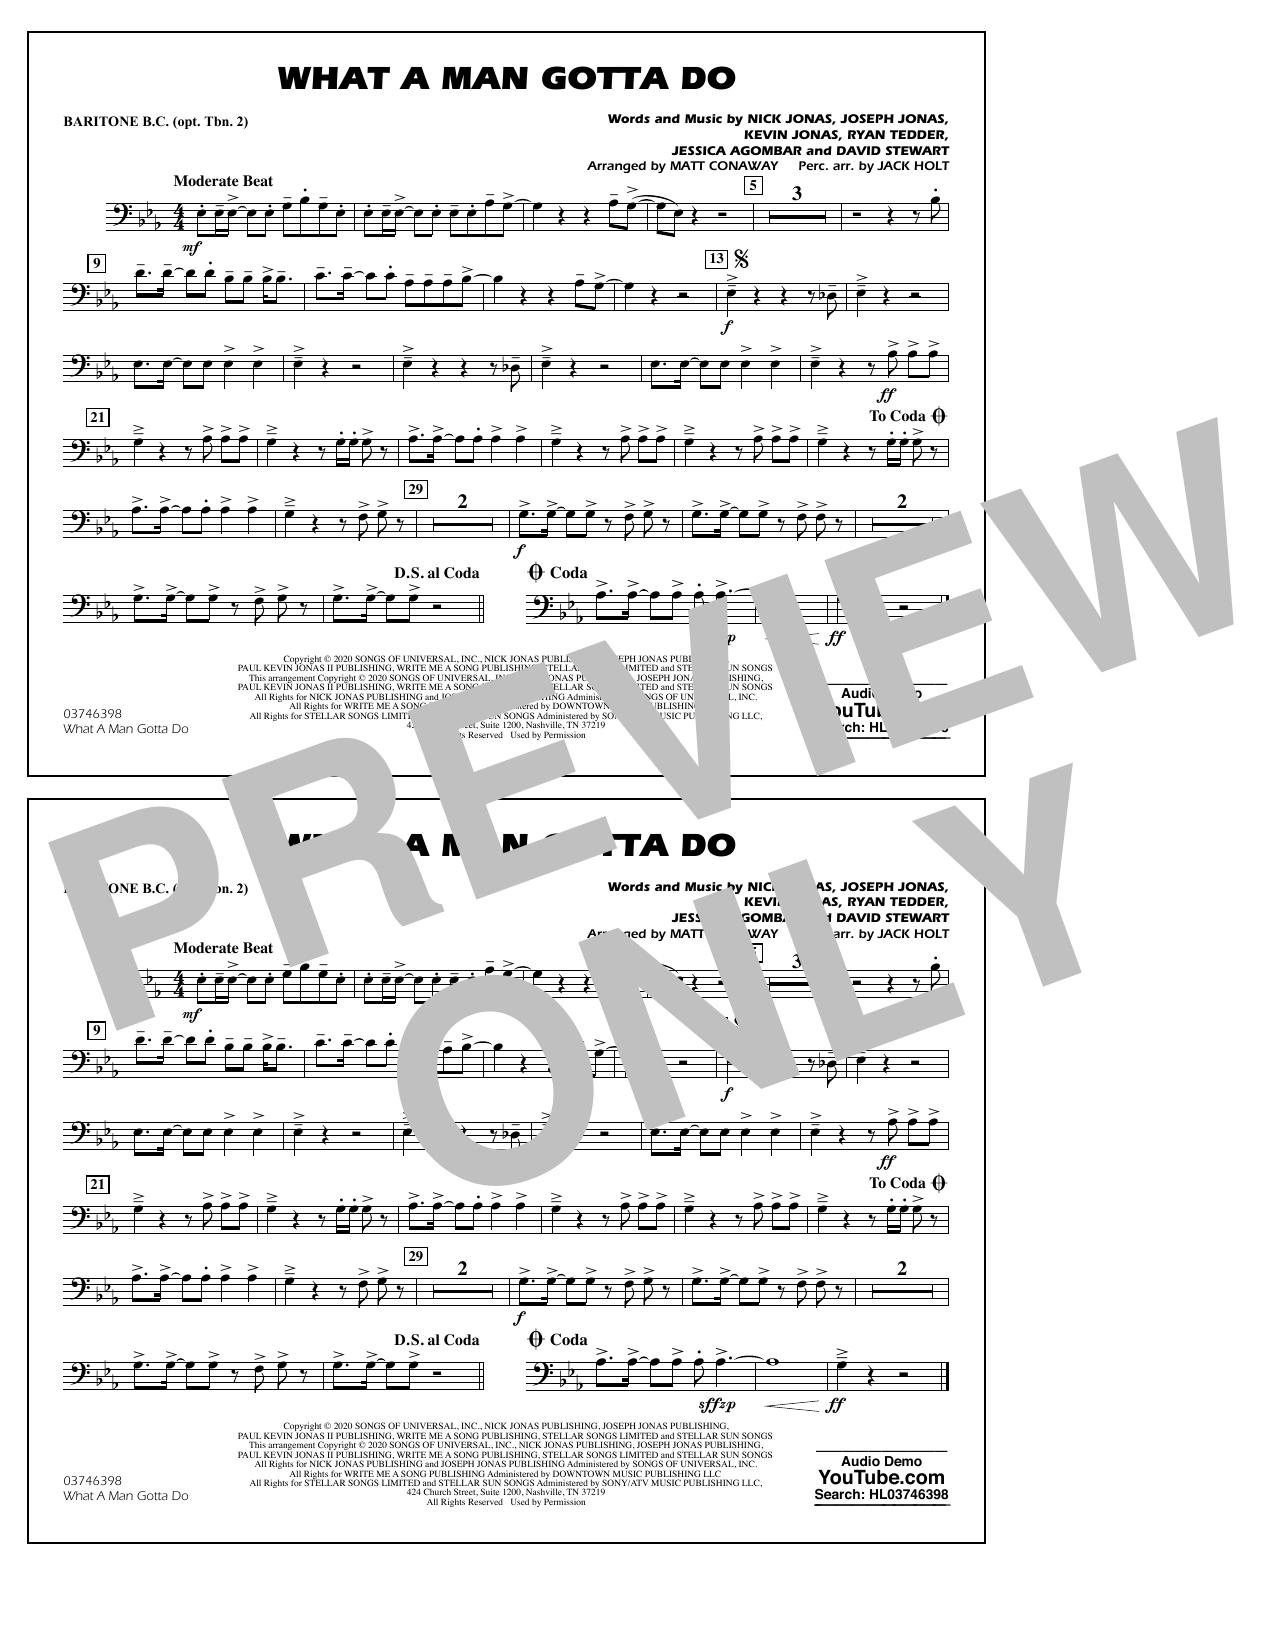 What a Man Gotta Do (arr. Jack Holt and Matt Conaway) - Baritone B.C. Sheet Music